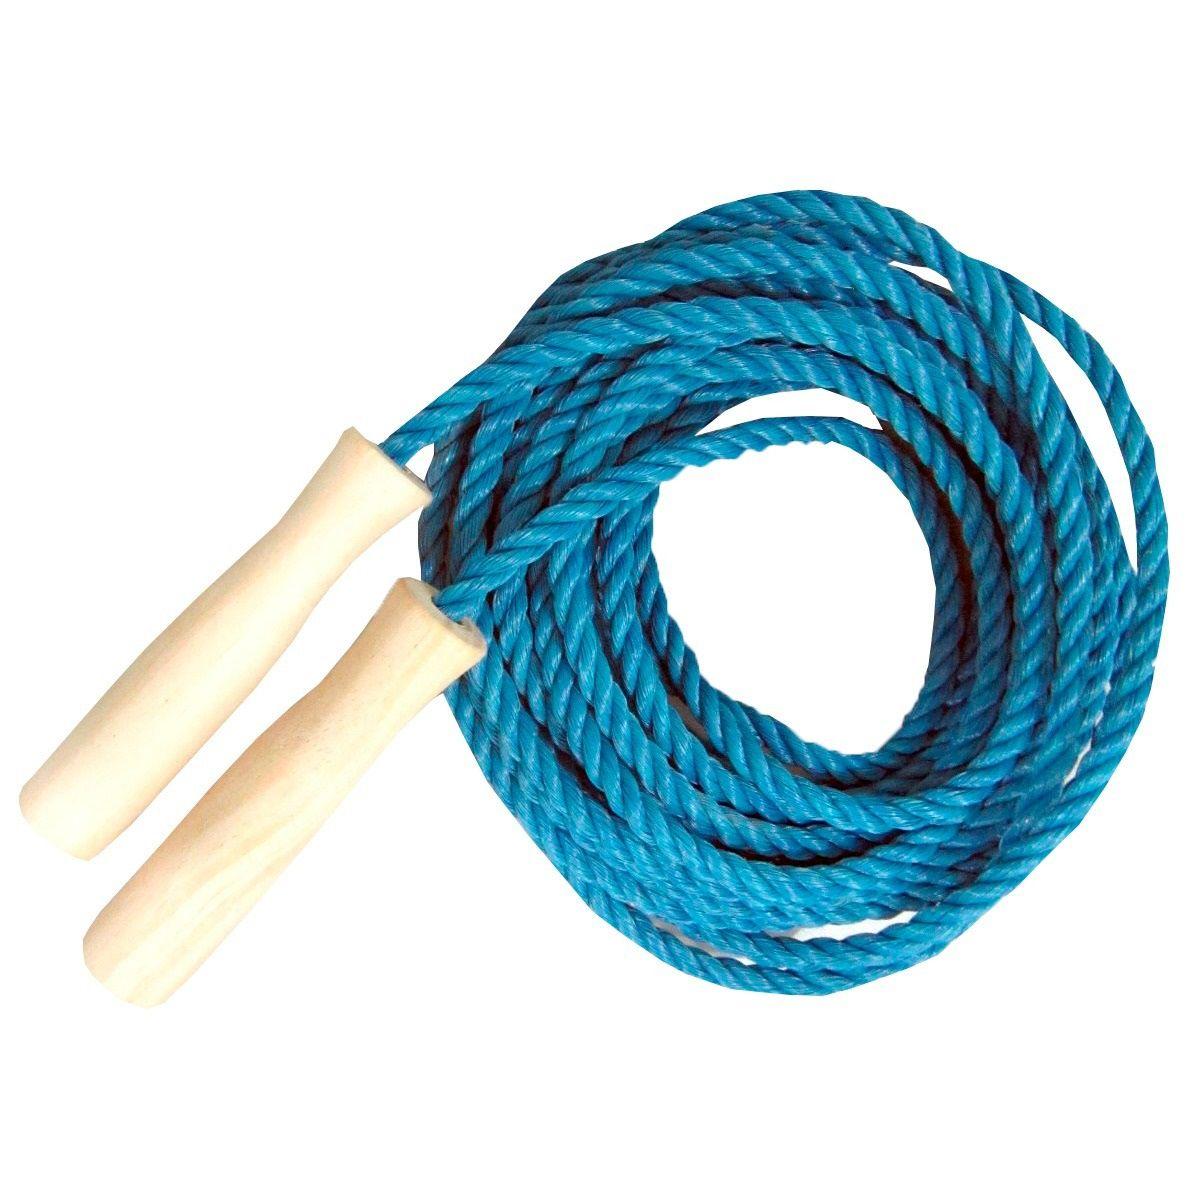 Pula Corda de Sisal Coletivo Azul